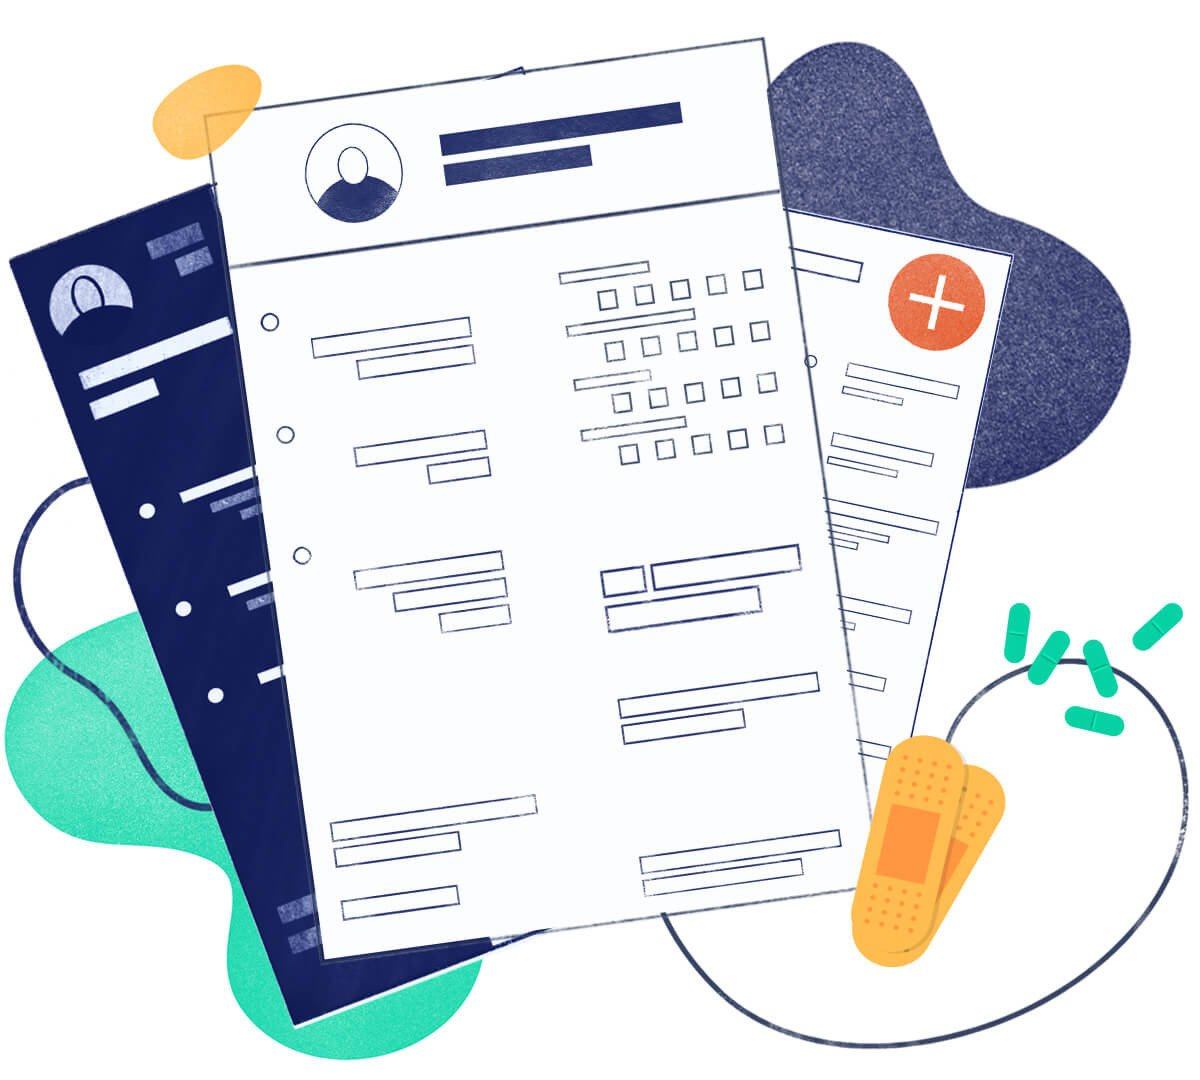 Nursing CV—Nurse CV Examples and 25+ Writing Tips